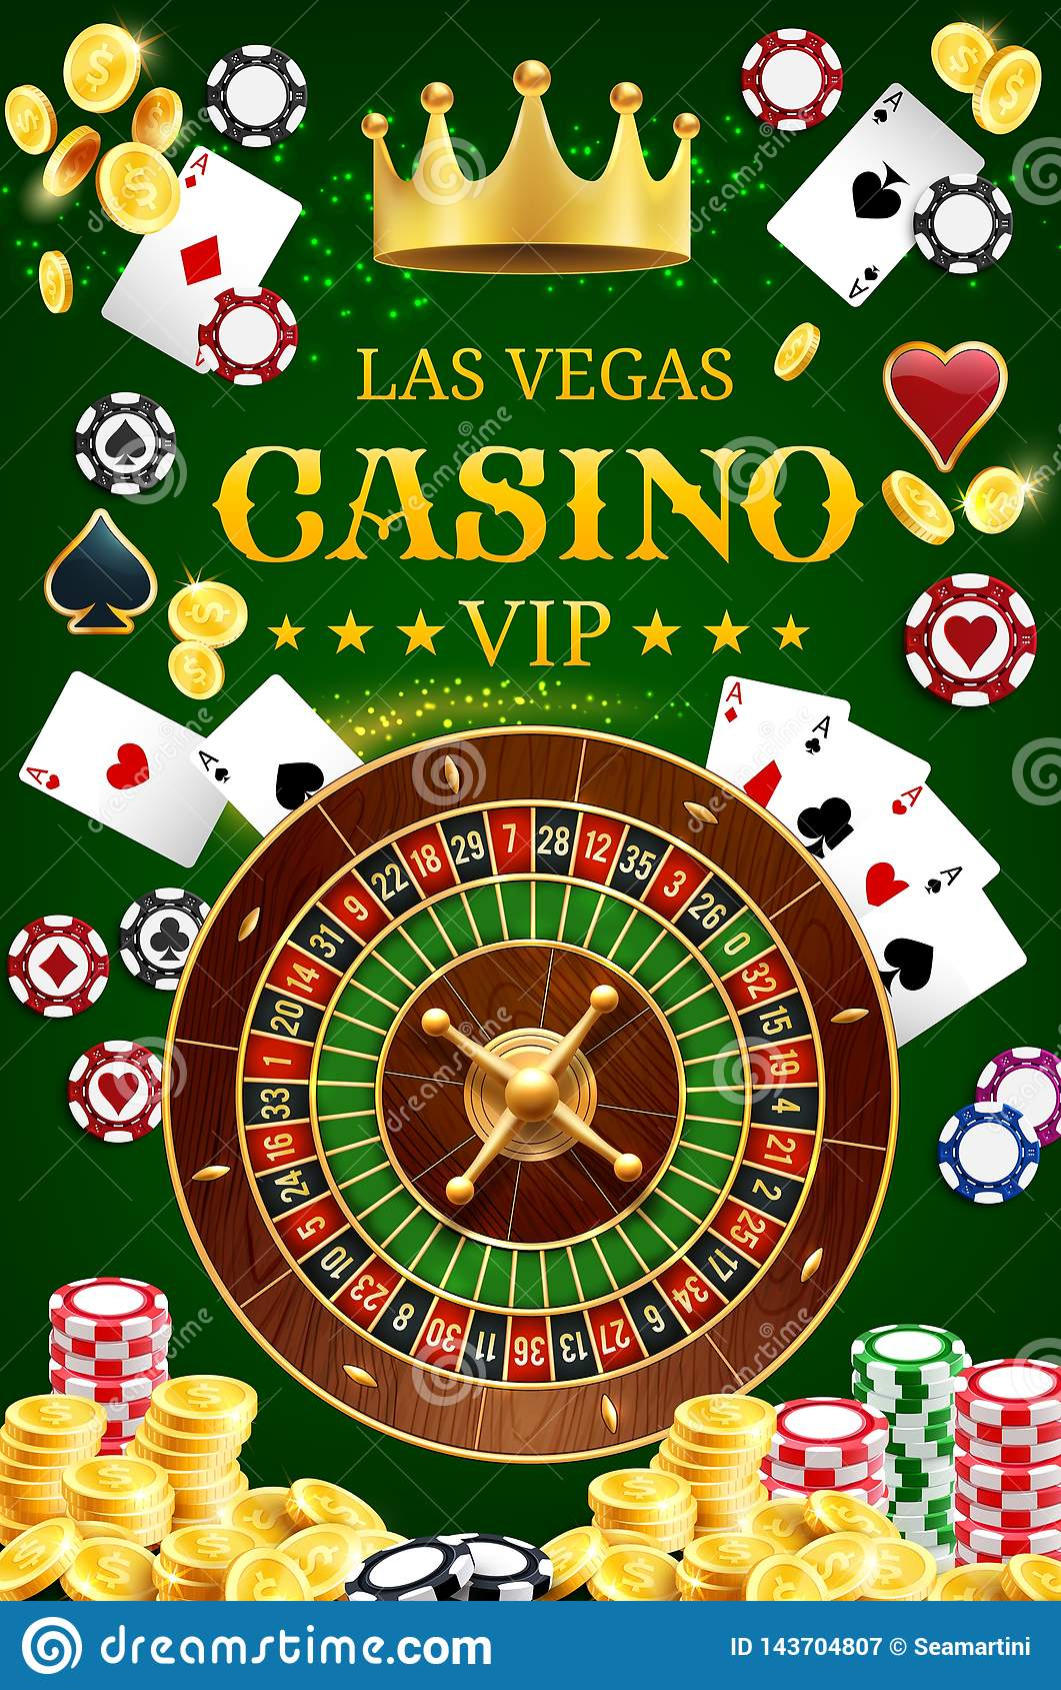 Казино фортуна на карте джеймс бонд 2007 казино рояль